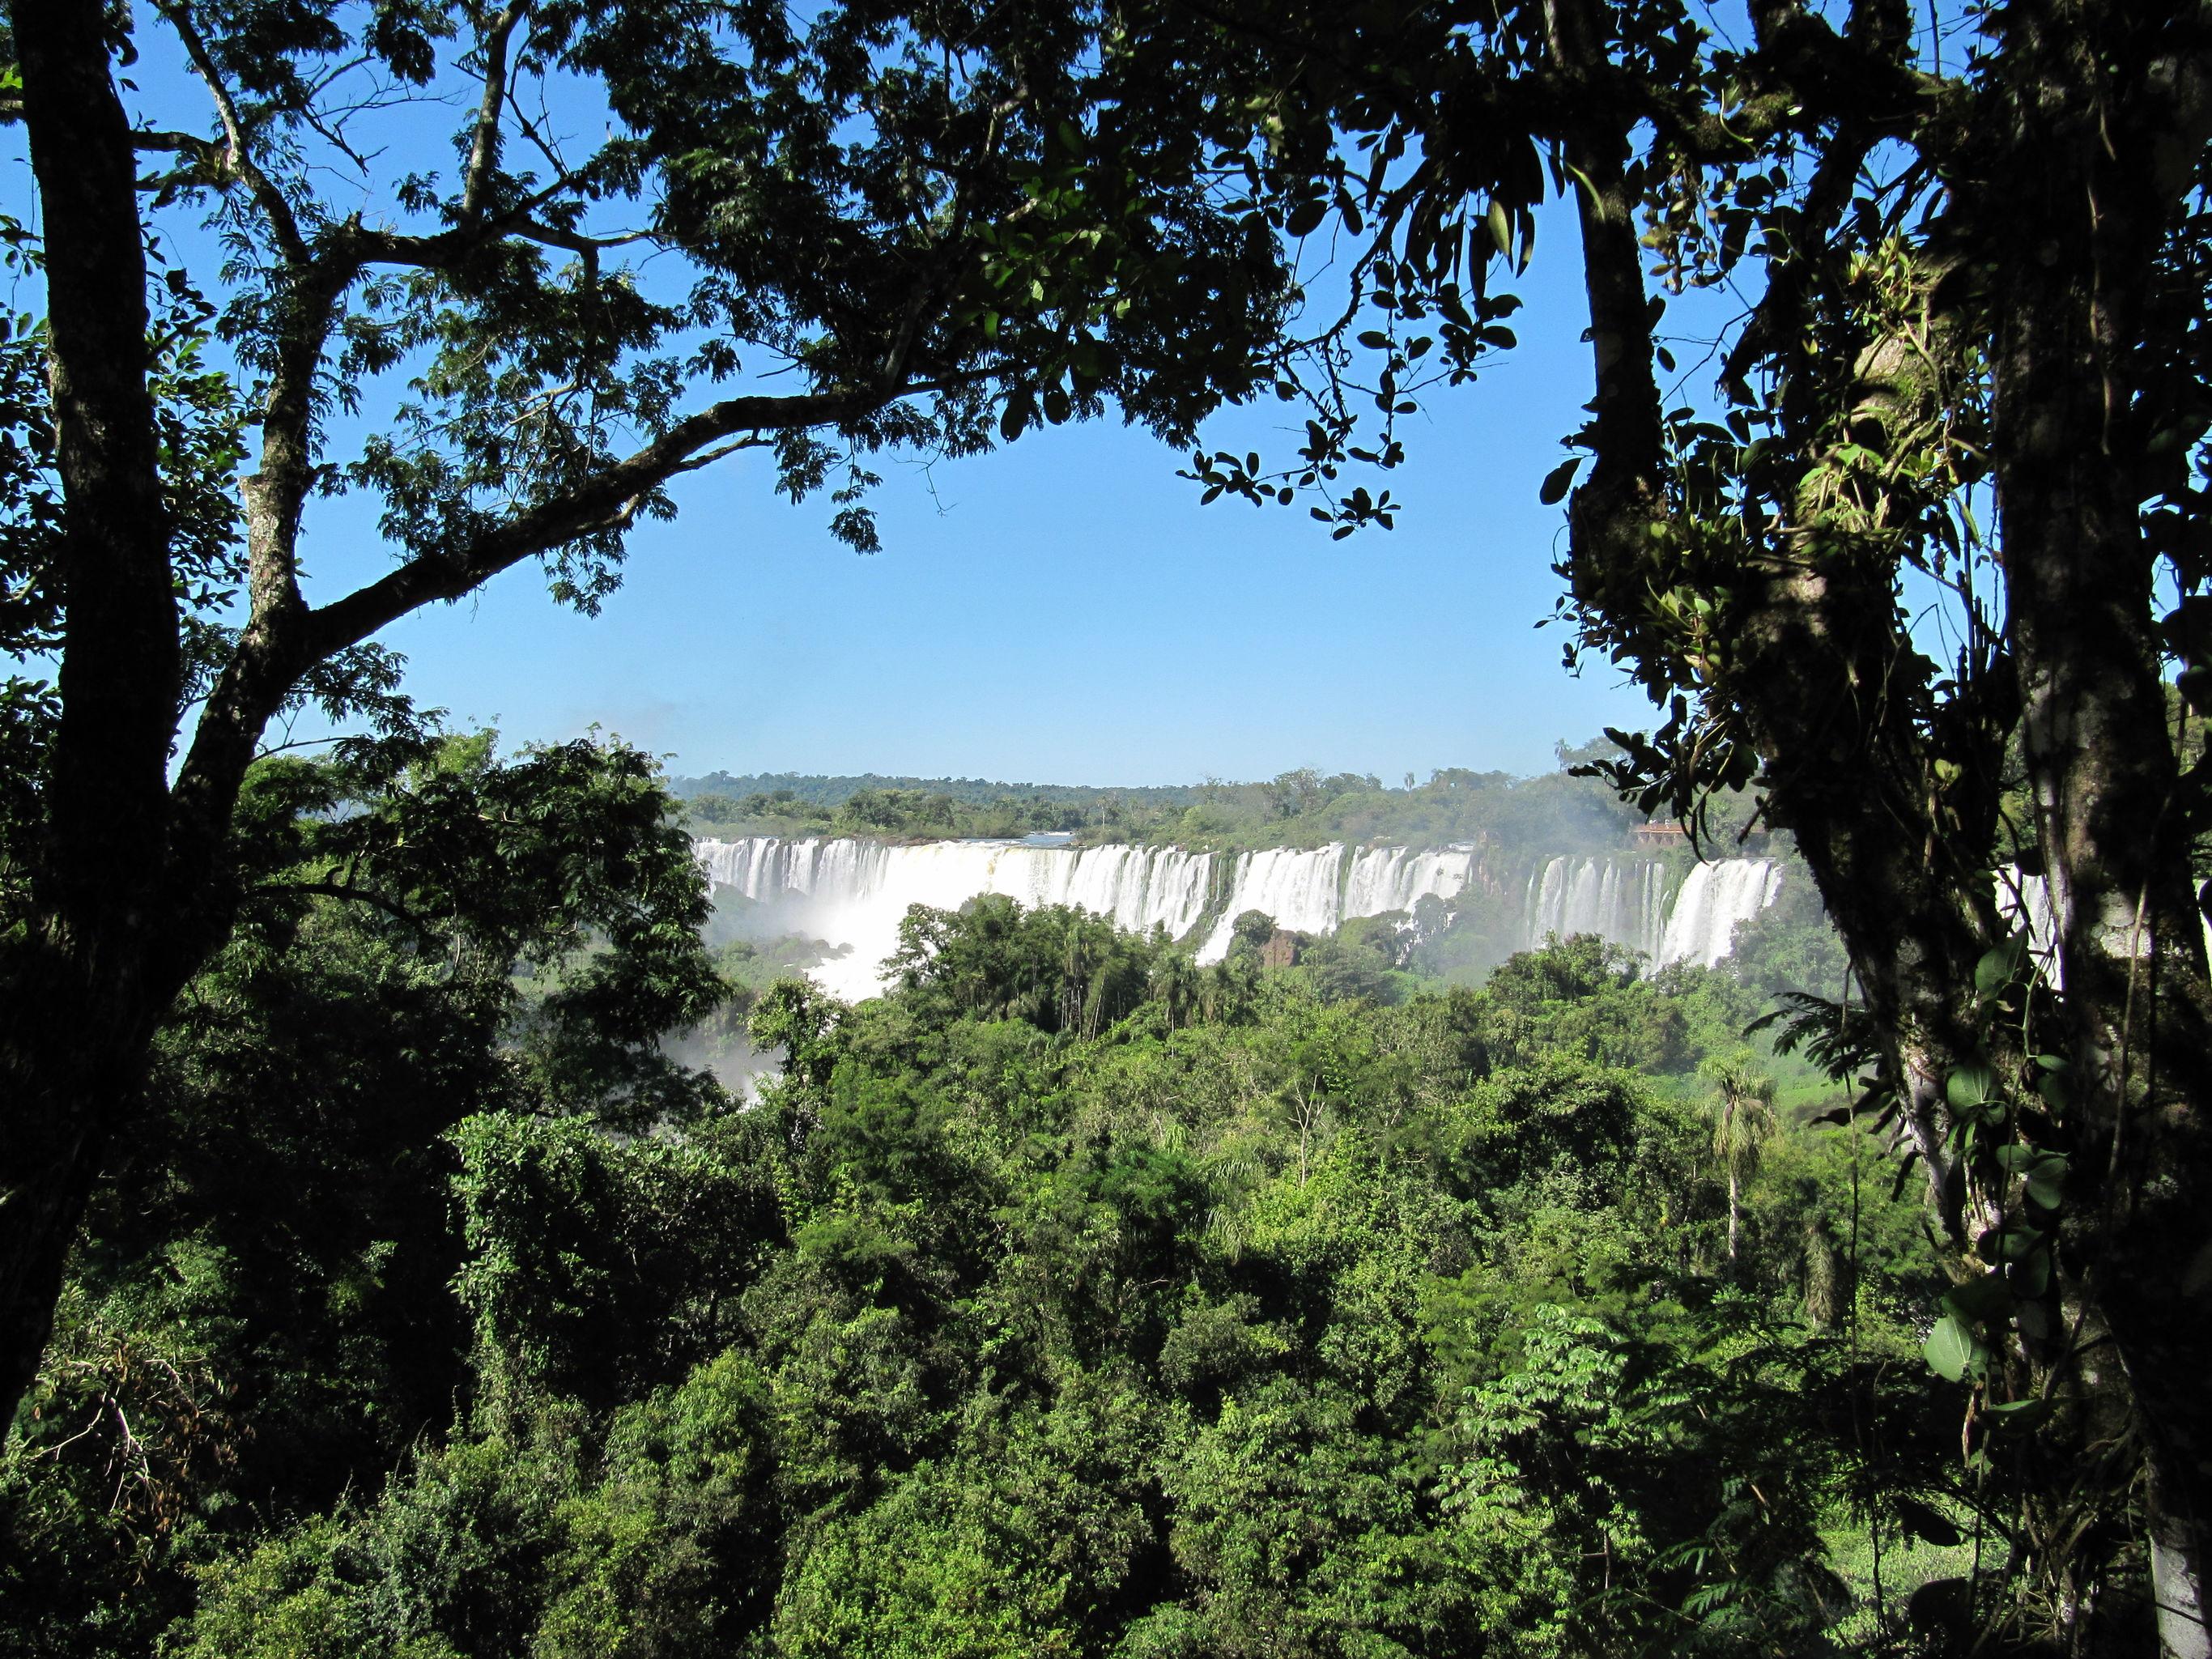 Sfeerimpressie Rondreis Argentinië: Hoogtepunten van Argentinië